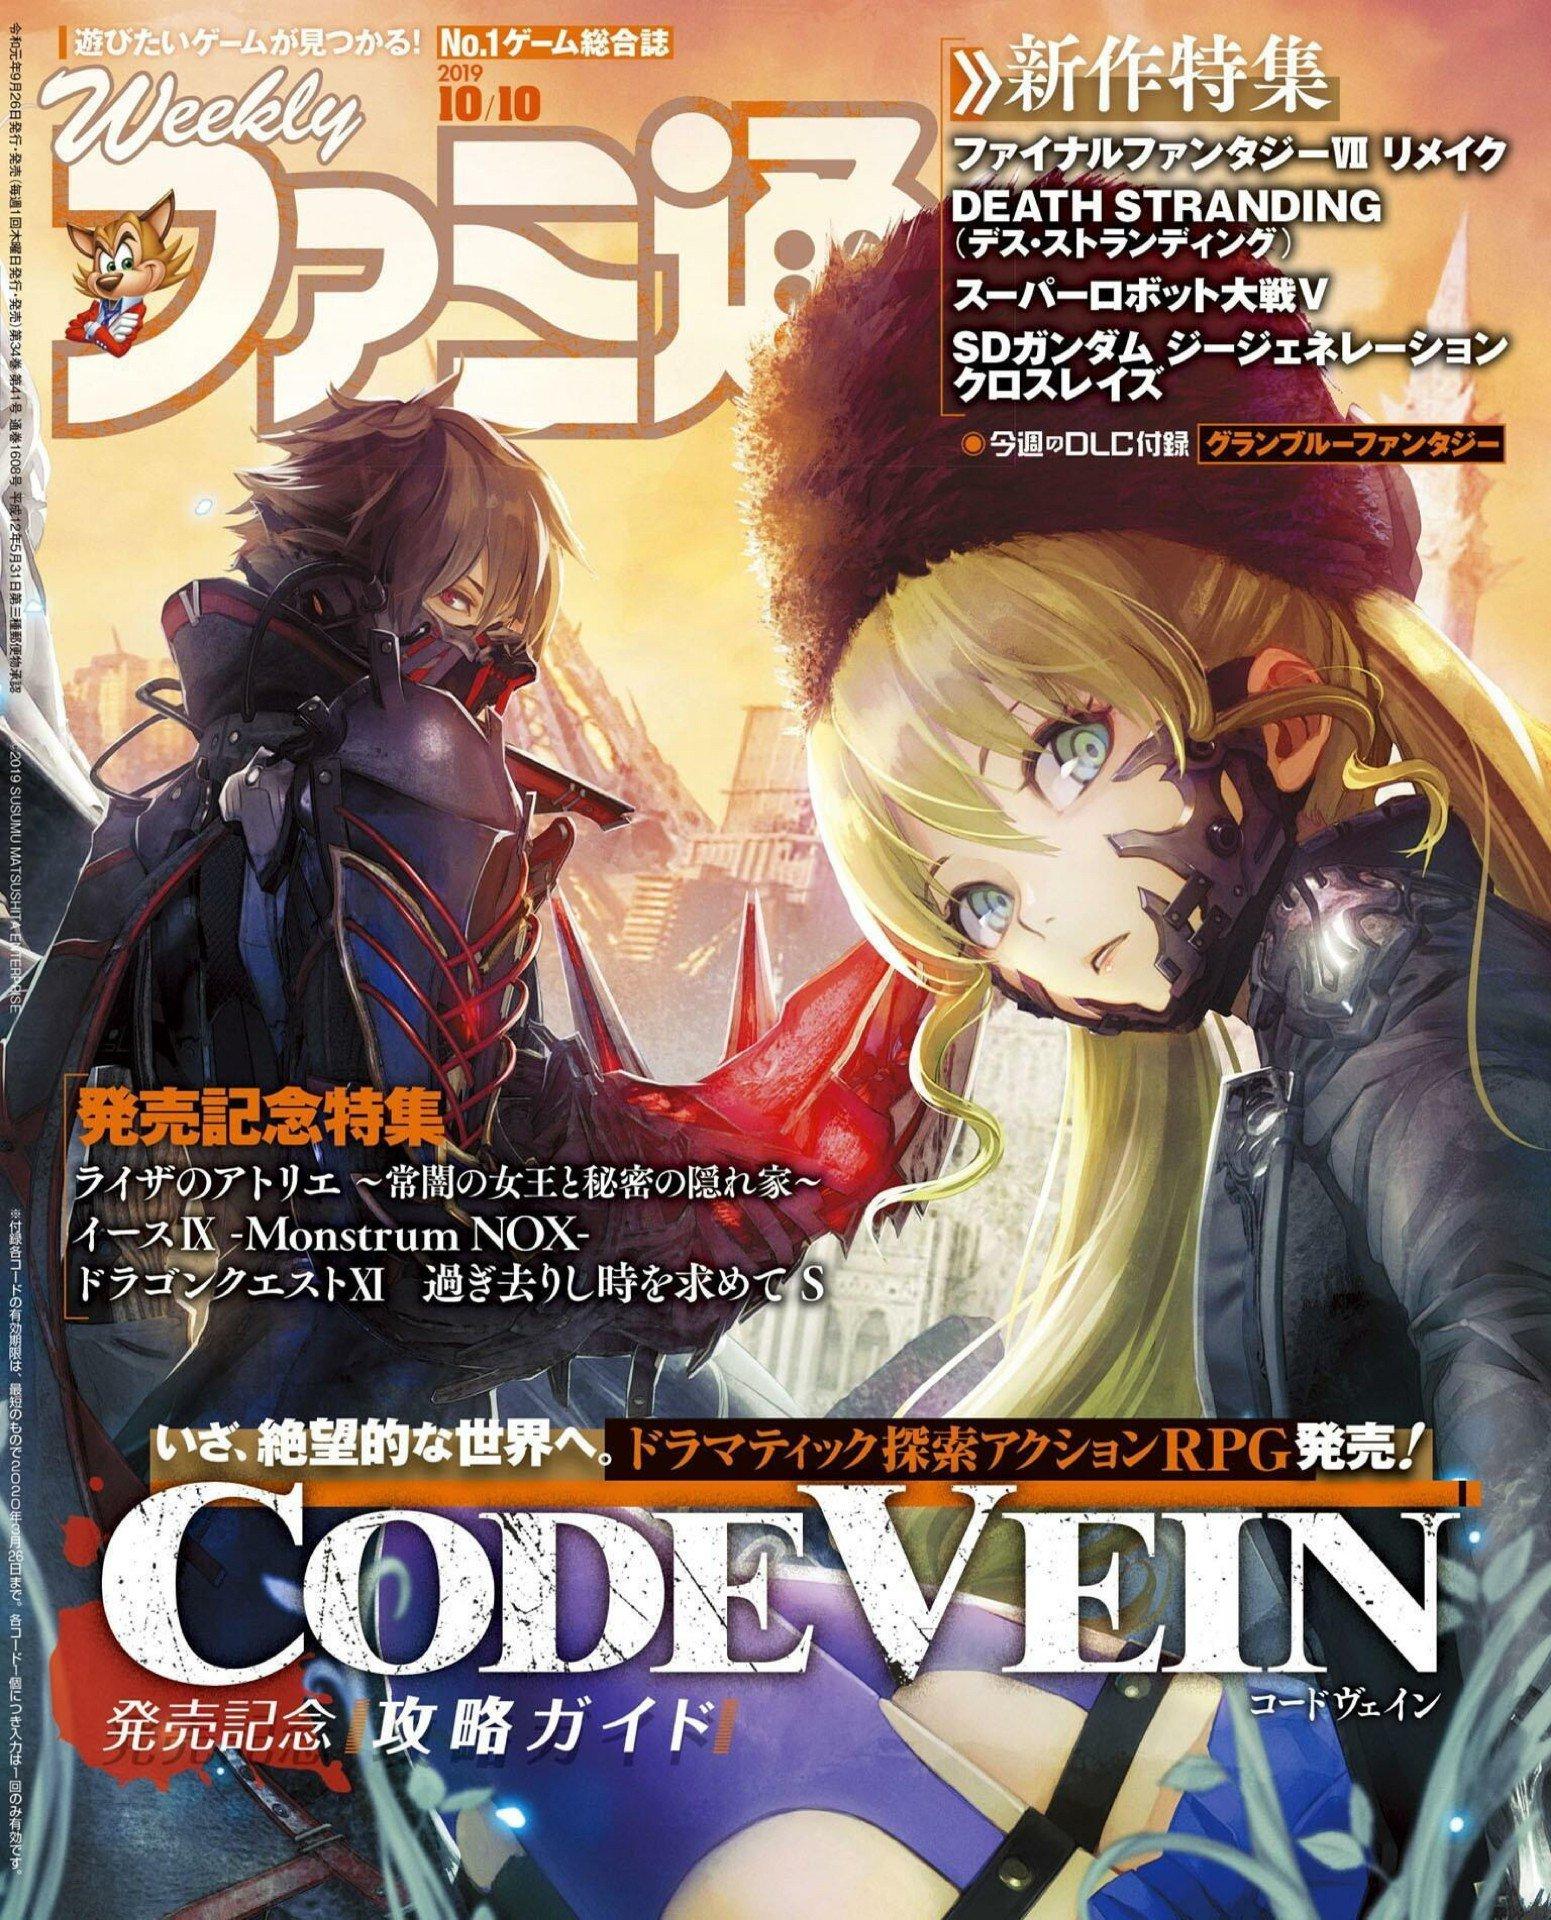 Famitsu 1608 (October 10, 2019)